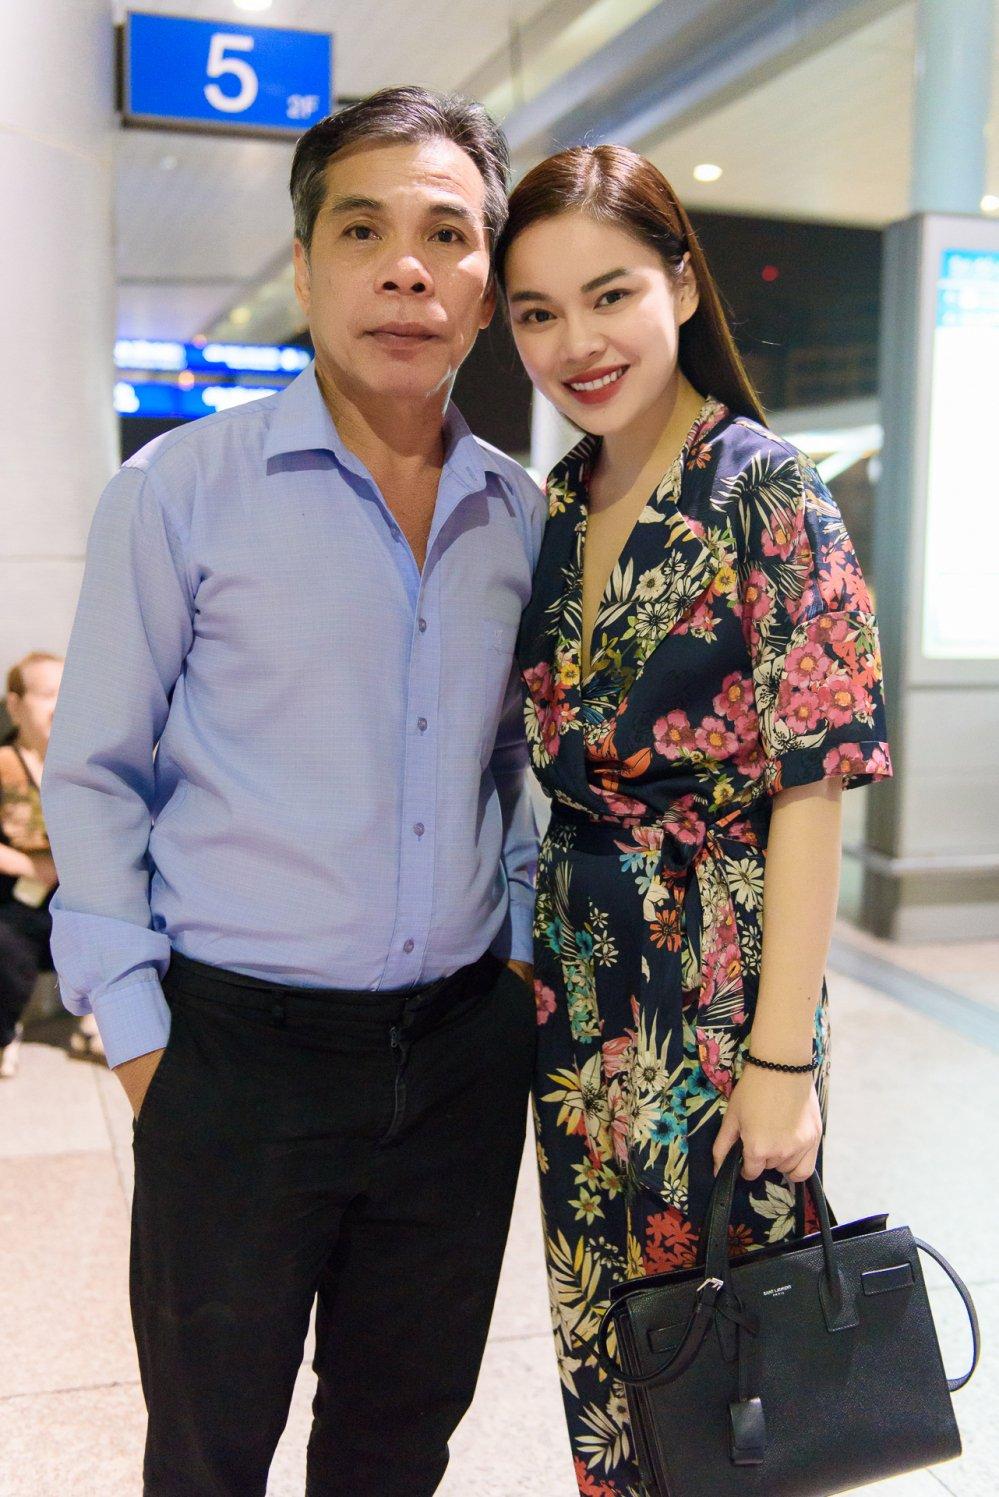 Con gai noi tieng, cha Giang Hong Ngoc van lai xe taxi hinh anh 1